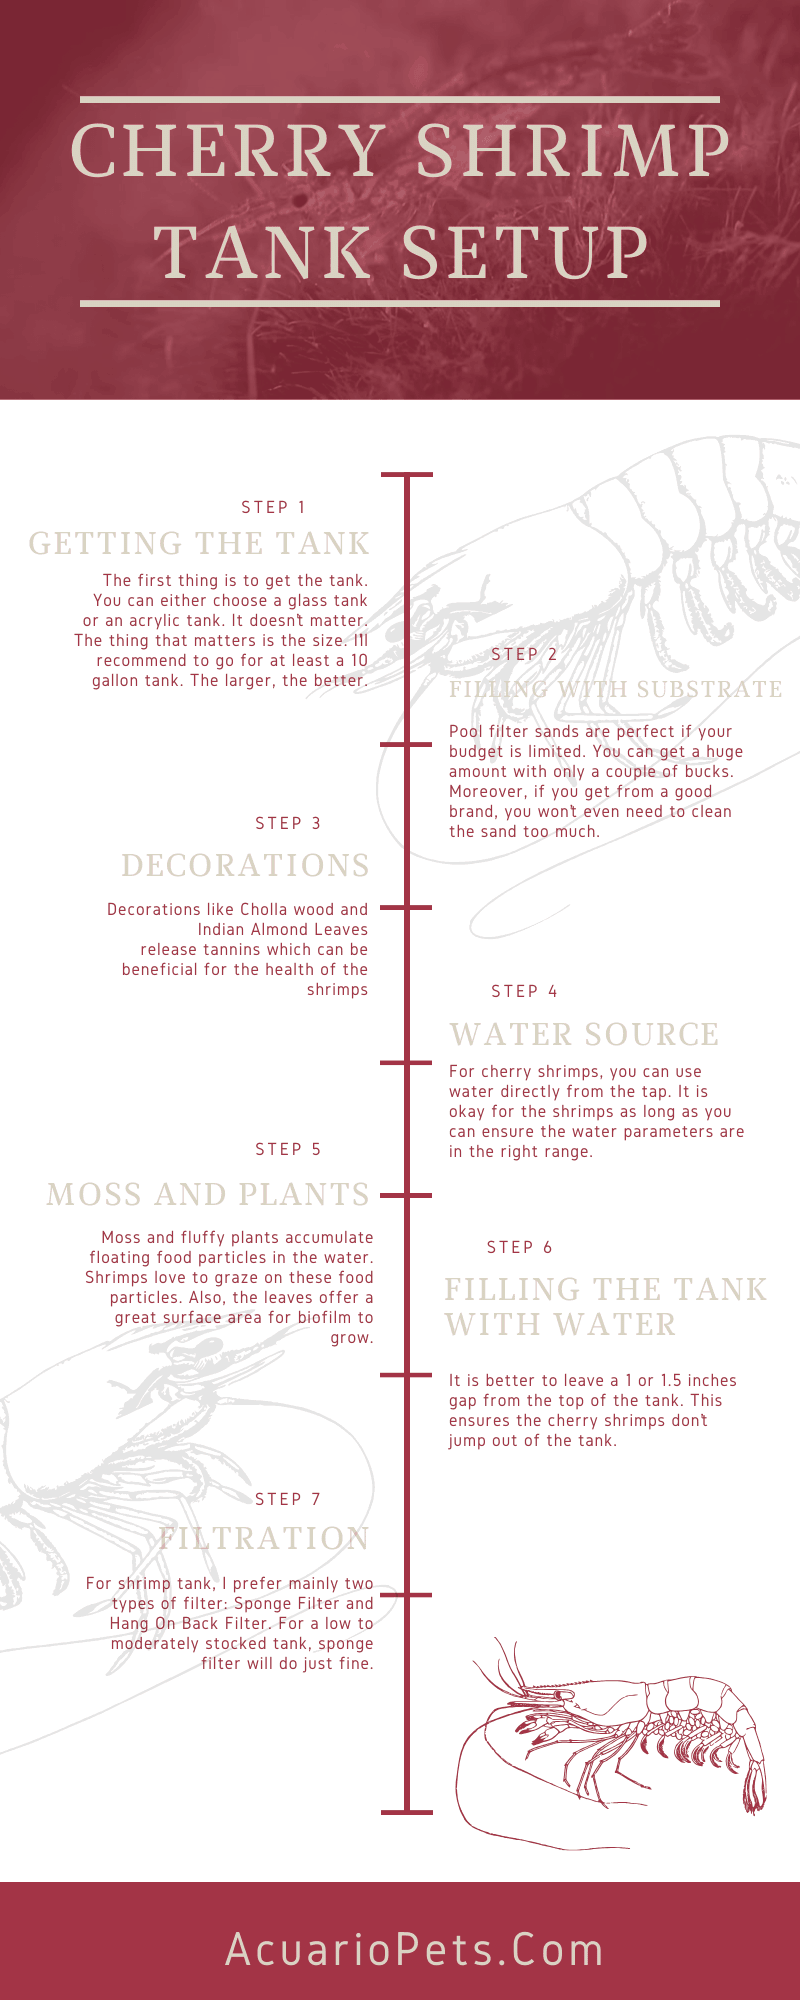 cherry shrimp tank setup infographic